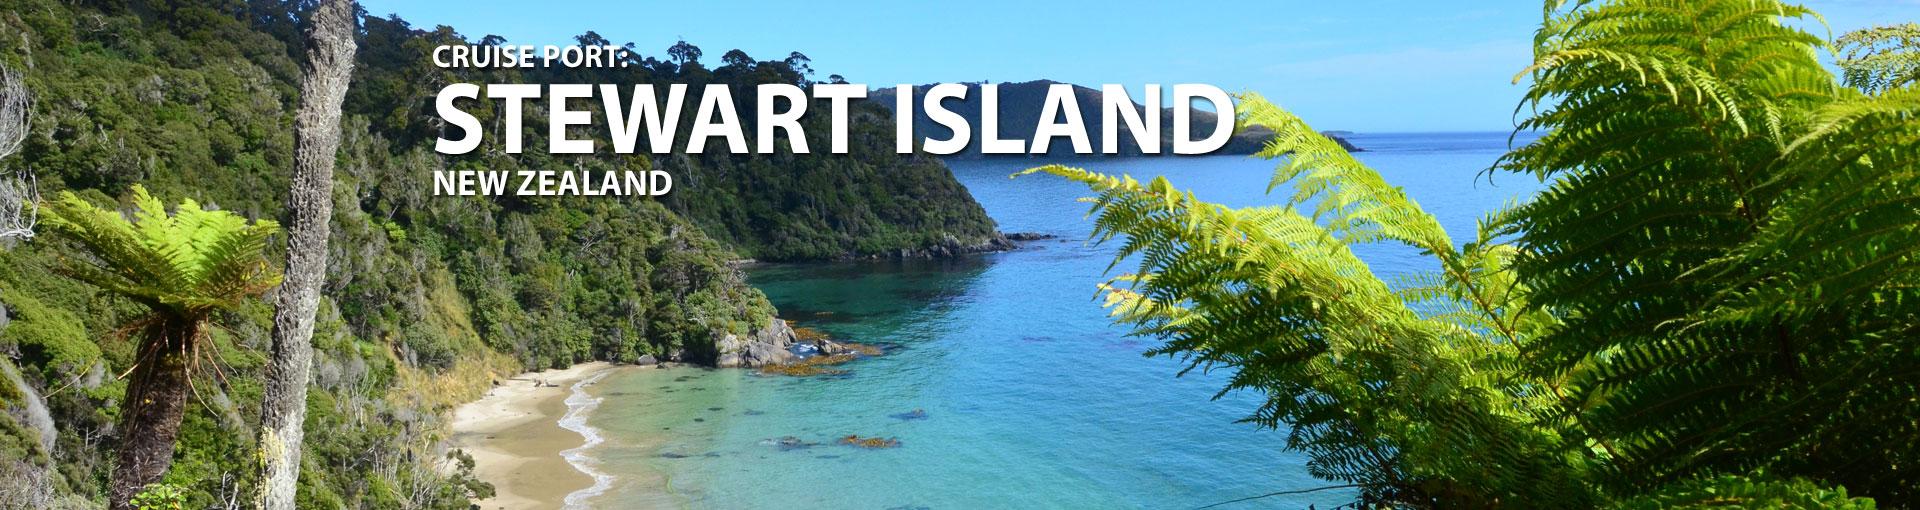 Cruises to Stewart Island, New Zealand